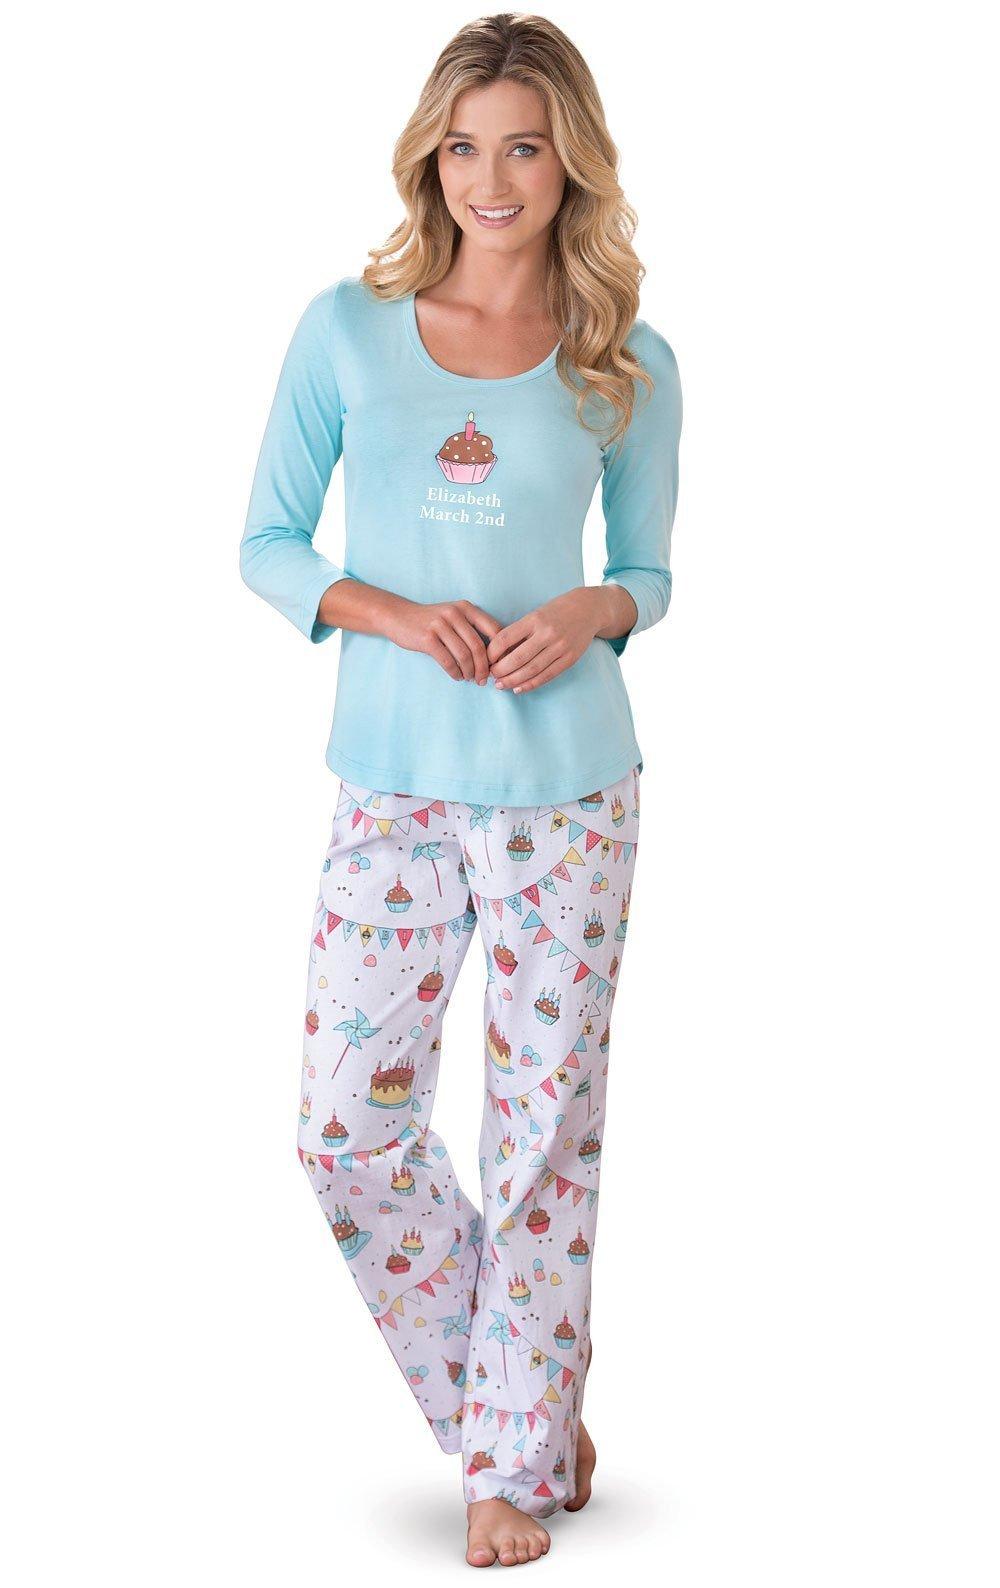 PajamaGram Personalized Birthday Gifts for Women: Birthday Pajamas, Blue MD 8-10